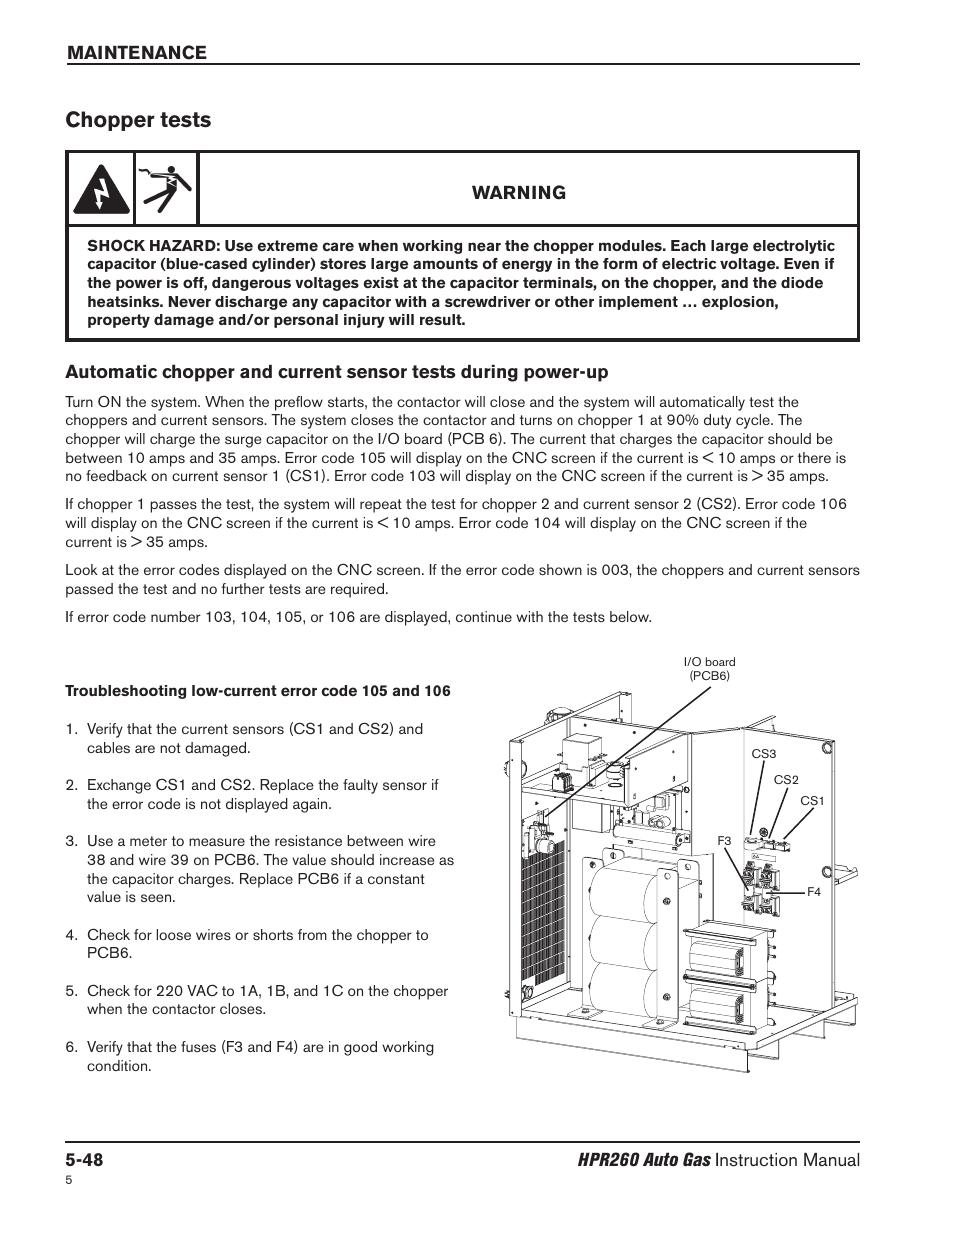 Chopper Tests 48 Hypertherm Hpr260 Manual Gas Capacitor Wiring Diagram Preventive Maintenance Program Rev5 User Page 192 317